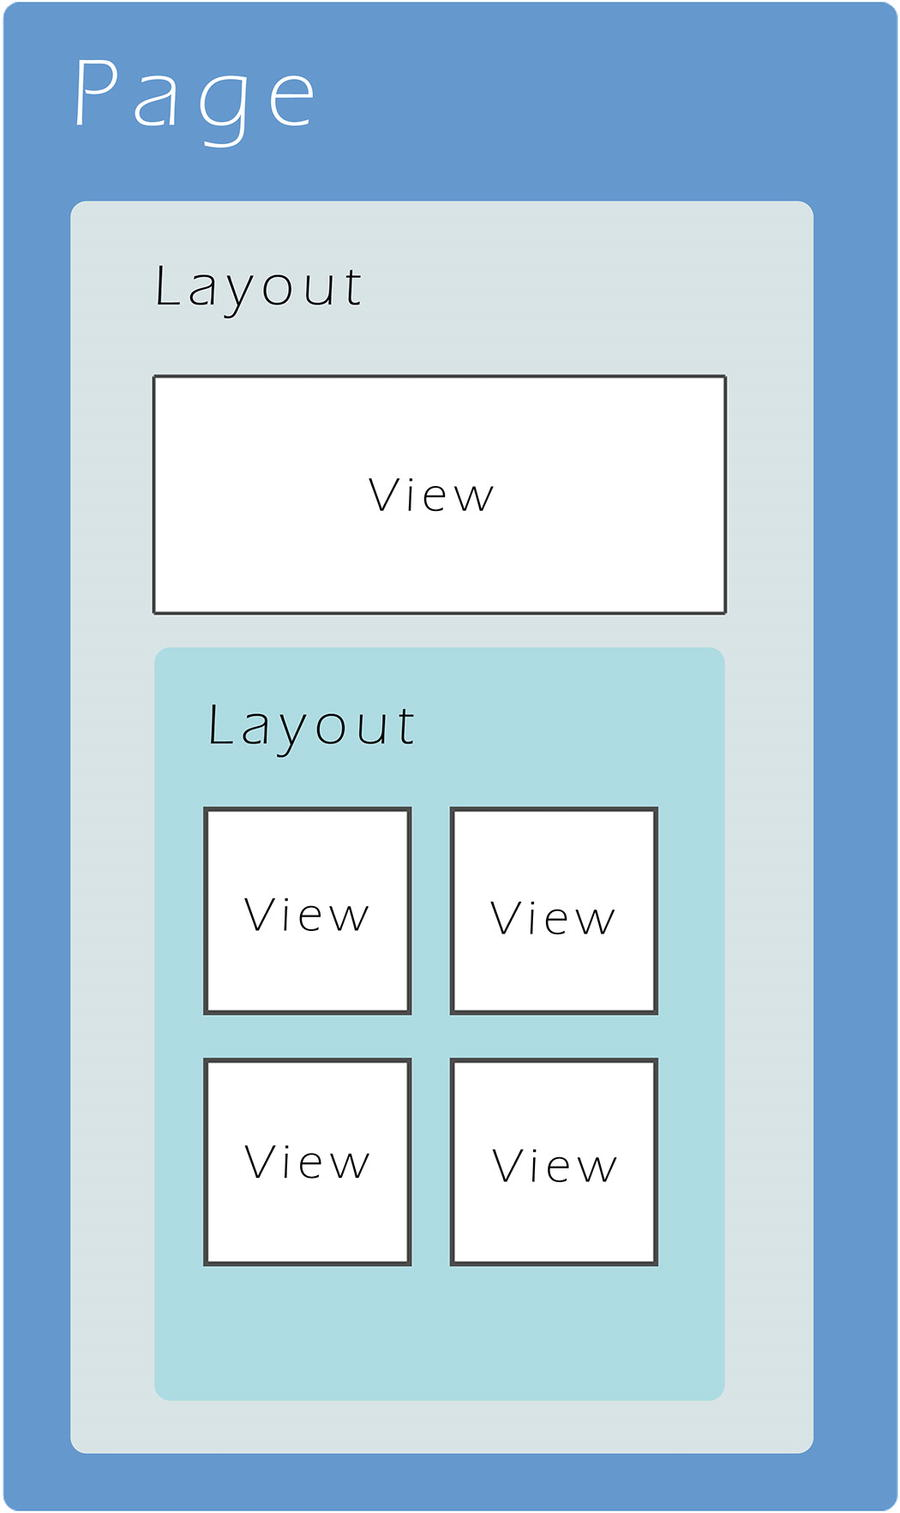 Building Apps Using Xamarin | SpringerLink